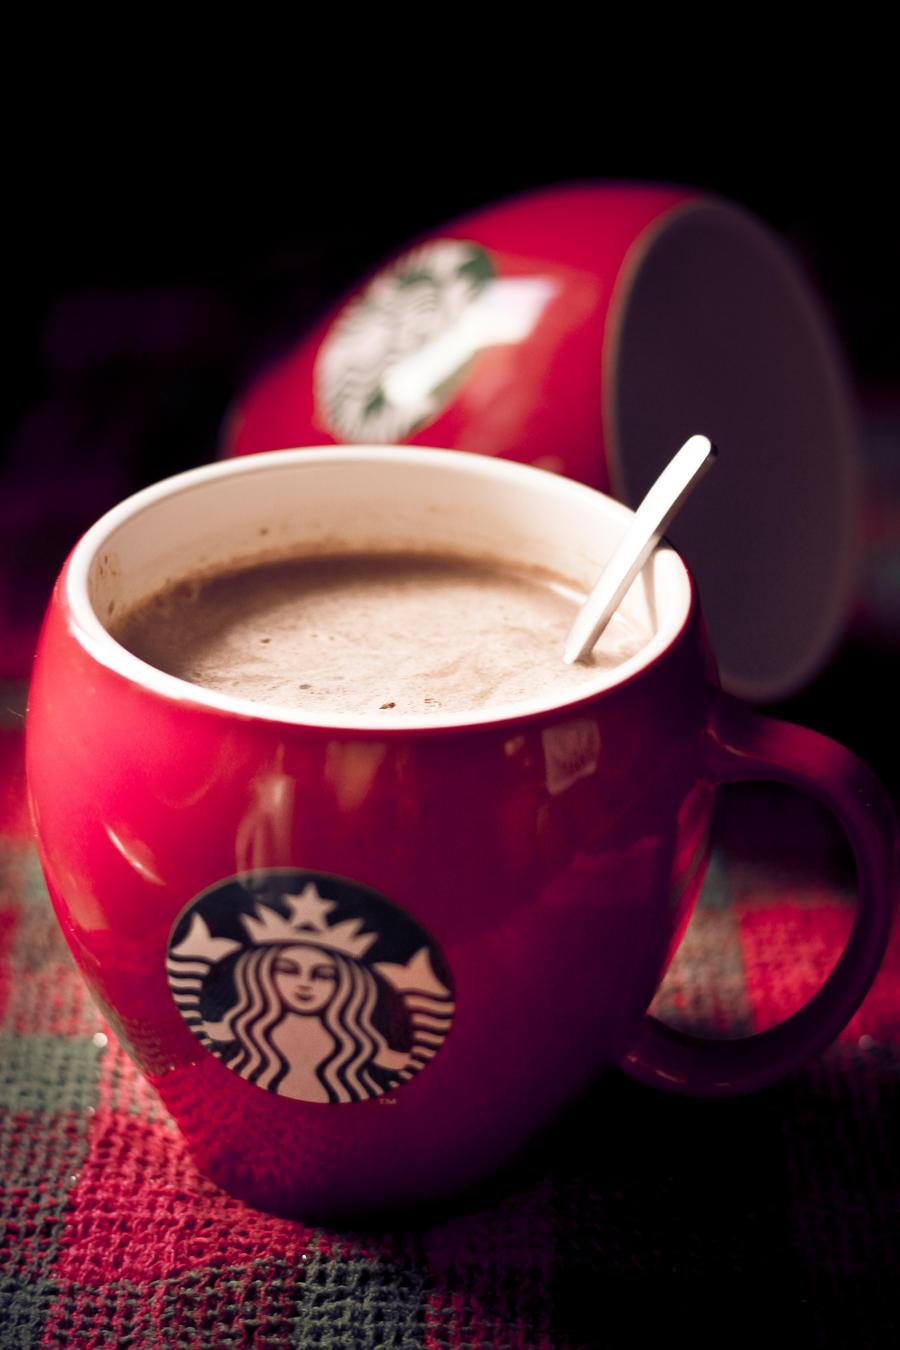 najromanticnija soljica za kafu...caj - Page 5 Starbucks_by_ariana1985-d4exzyk